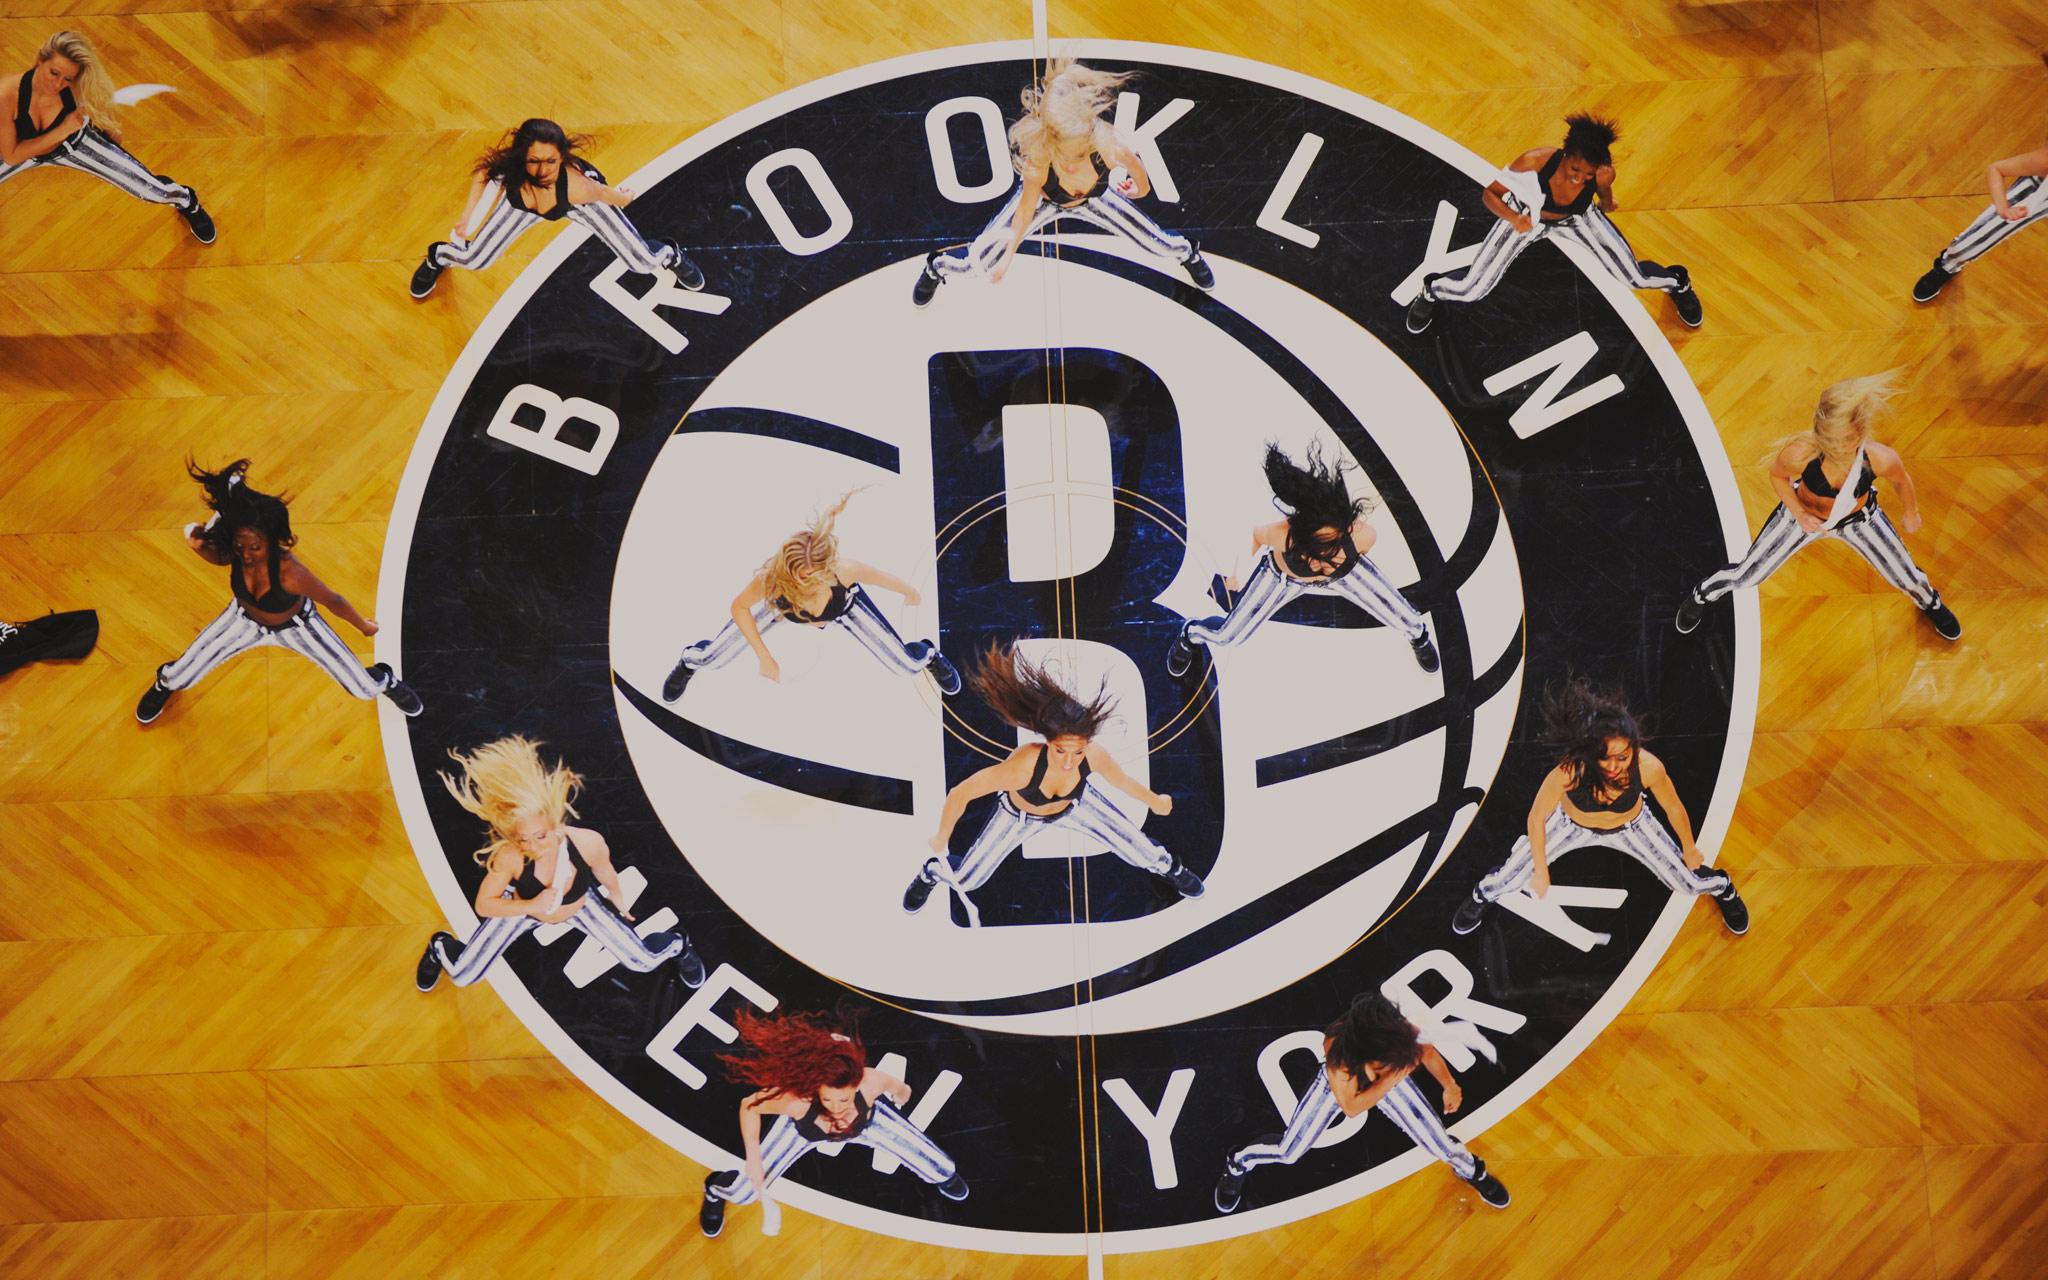 The Brooklynettes